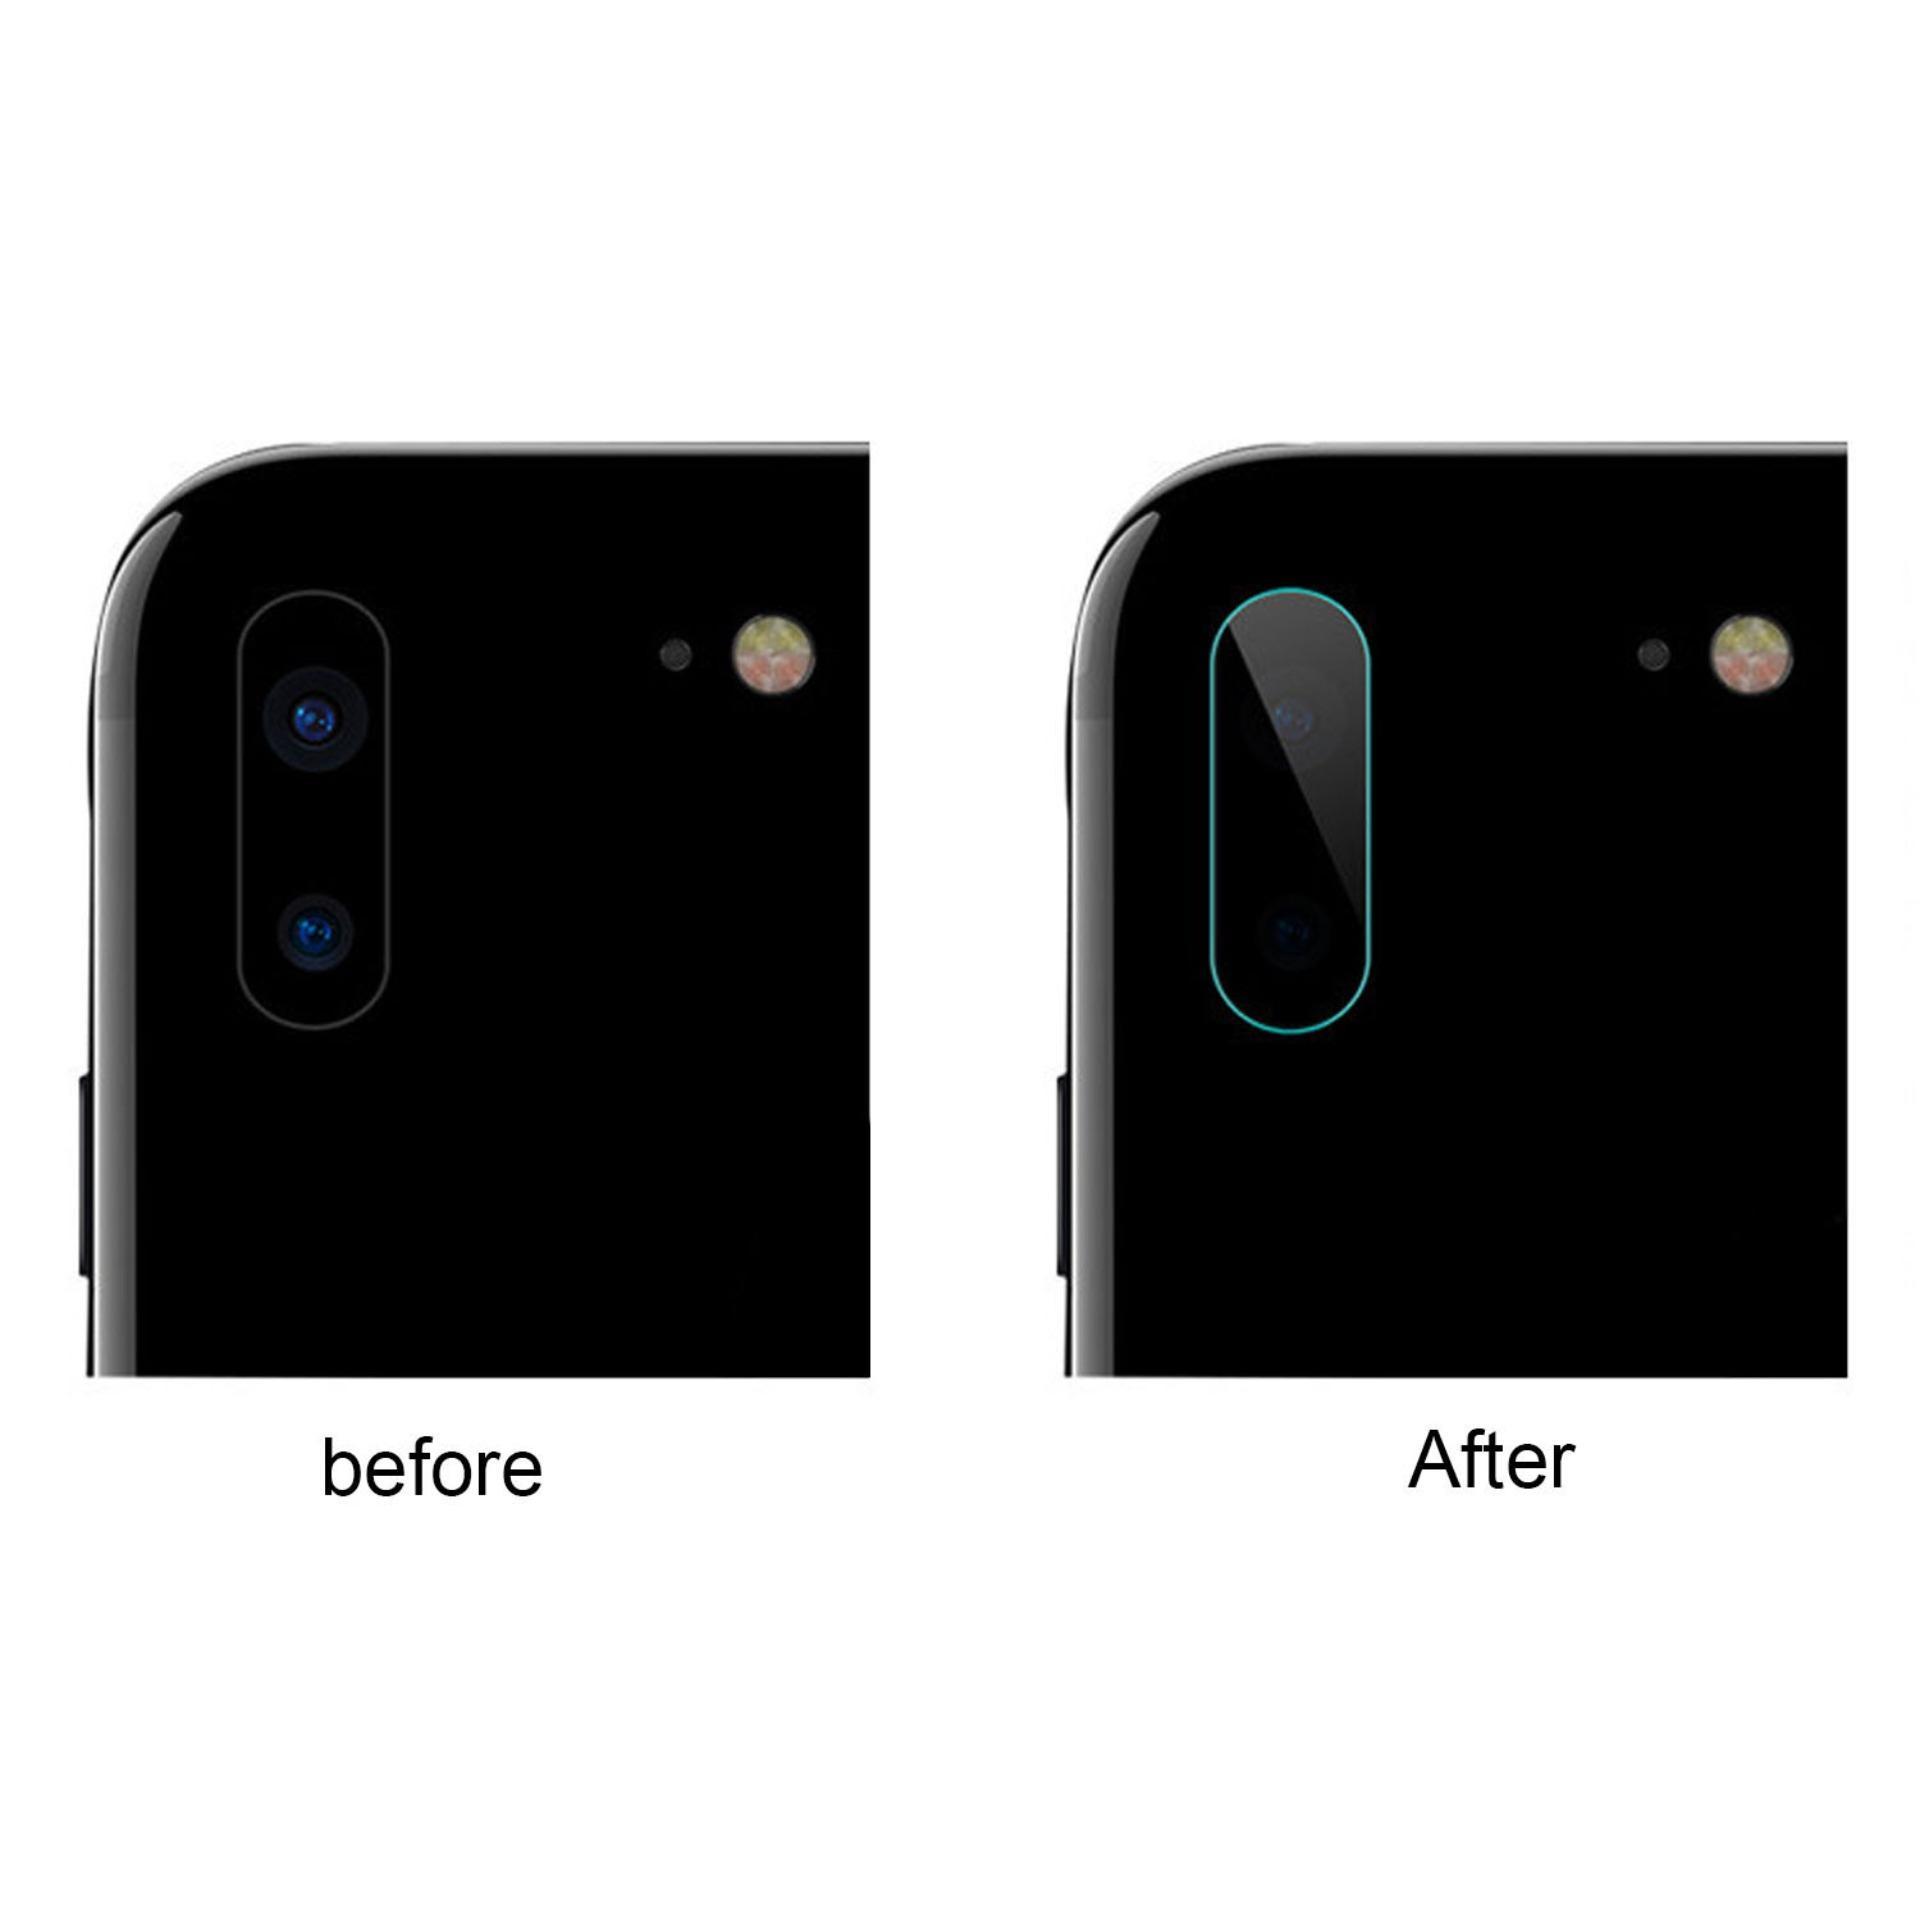 5 Pcs TPU HD Kamera Belakang Lensa Pelindung Penutup Film Pelindung Anti Gores Anti-Shock